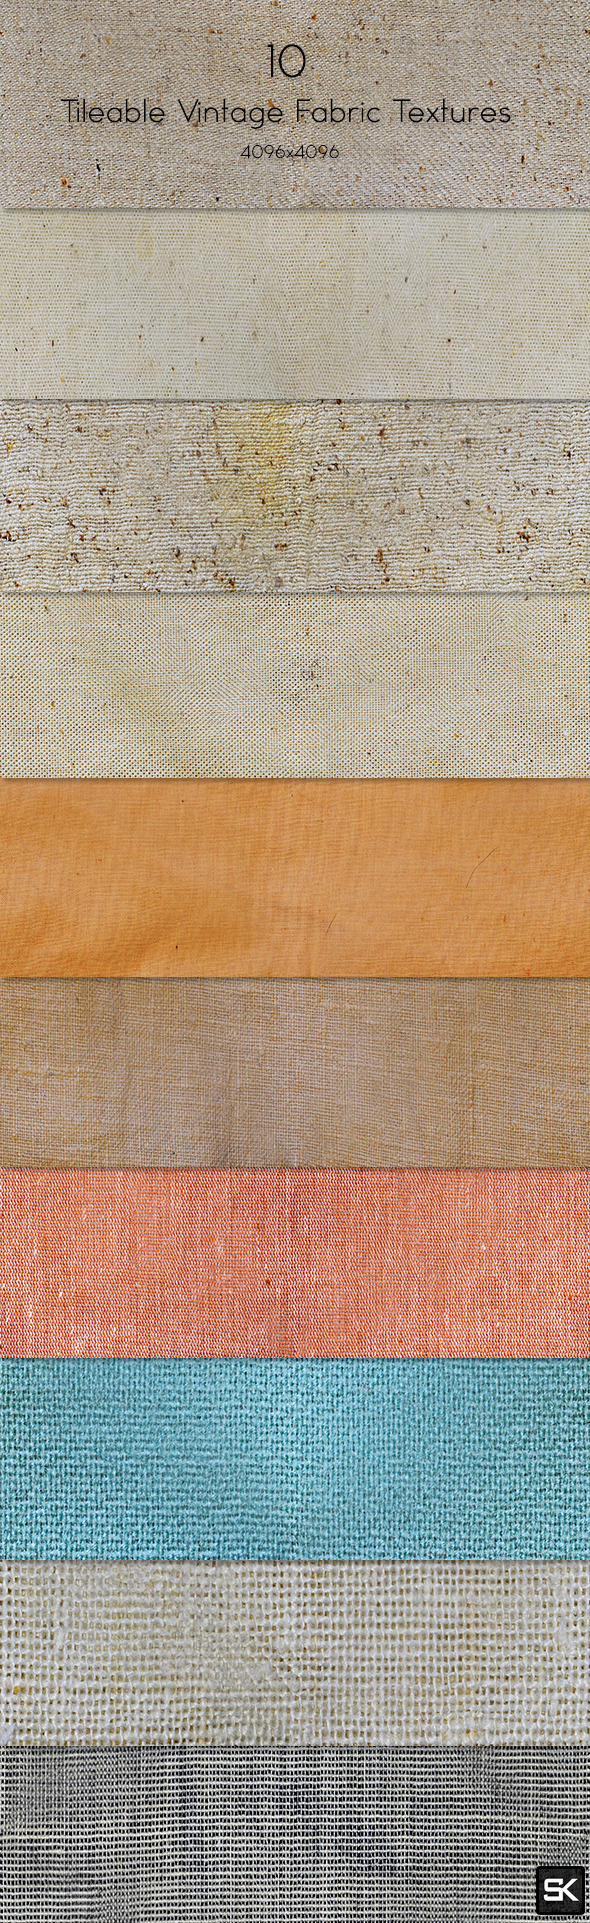 10 Tileable Vintage Fabric Texture - Miscellaneous Textures / Fills / Patterns